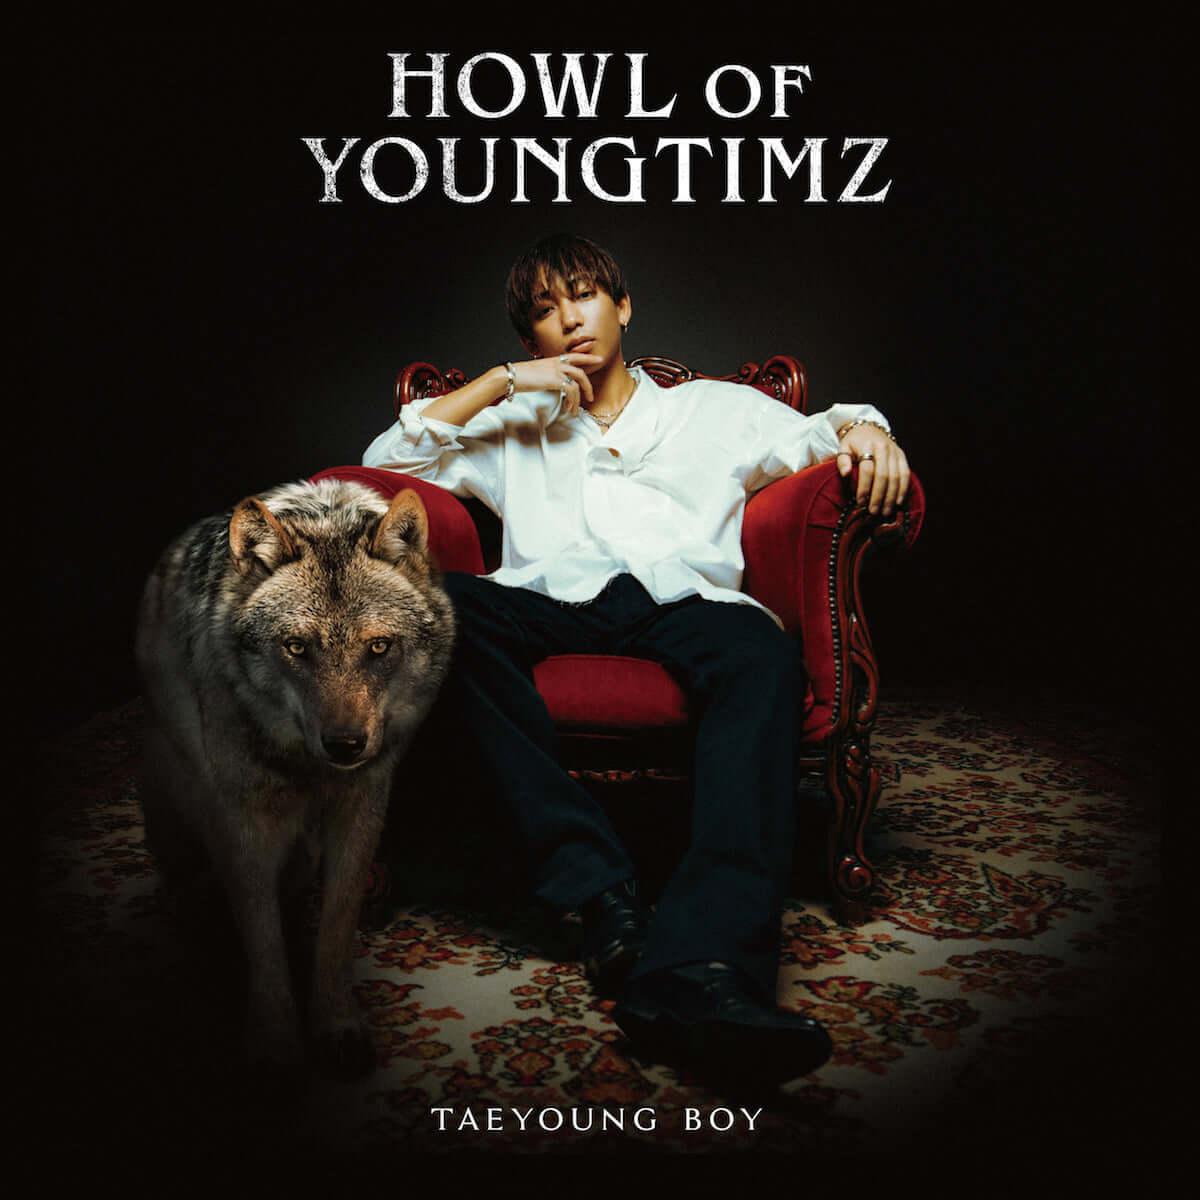 Taeyoung Boy、待望の1stアルバム収録「DOGS」のMVが本日公開!客演にWILYWNKA music190227_taeyoungboy_1-1200x1200